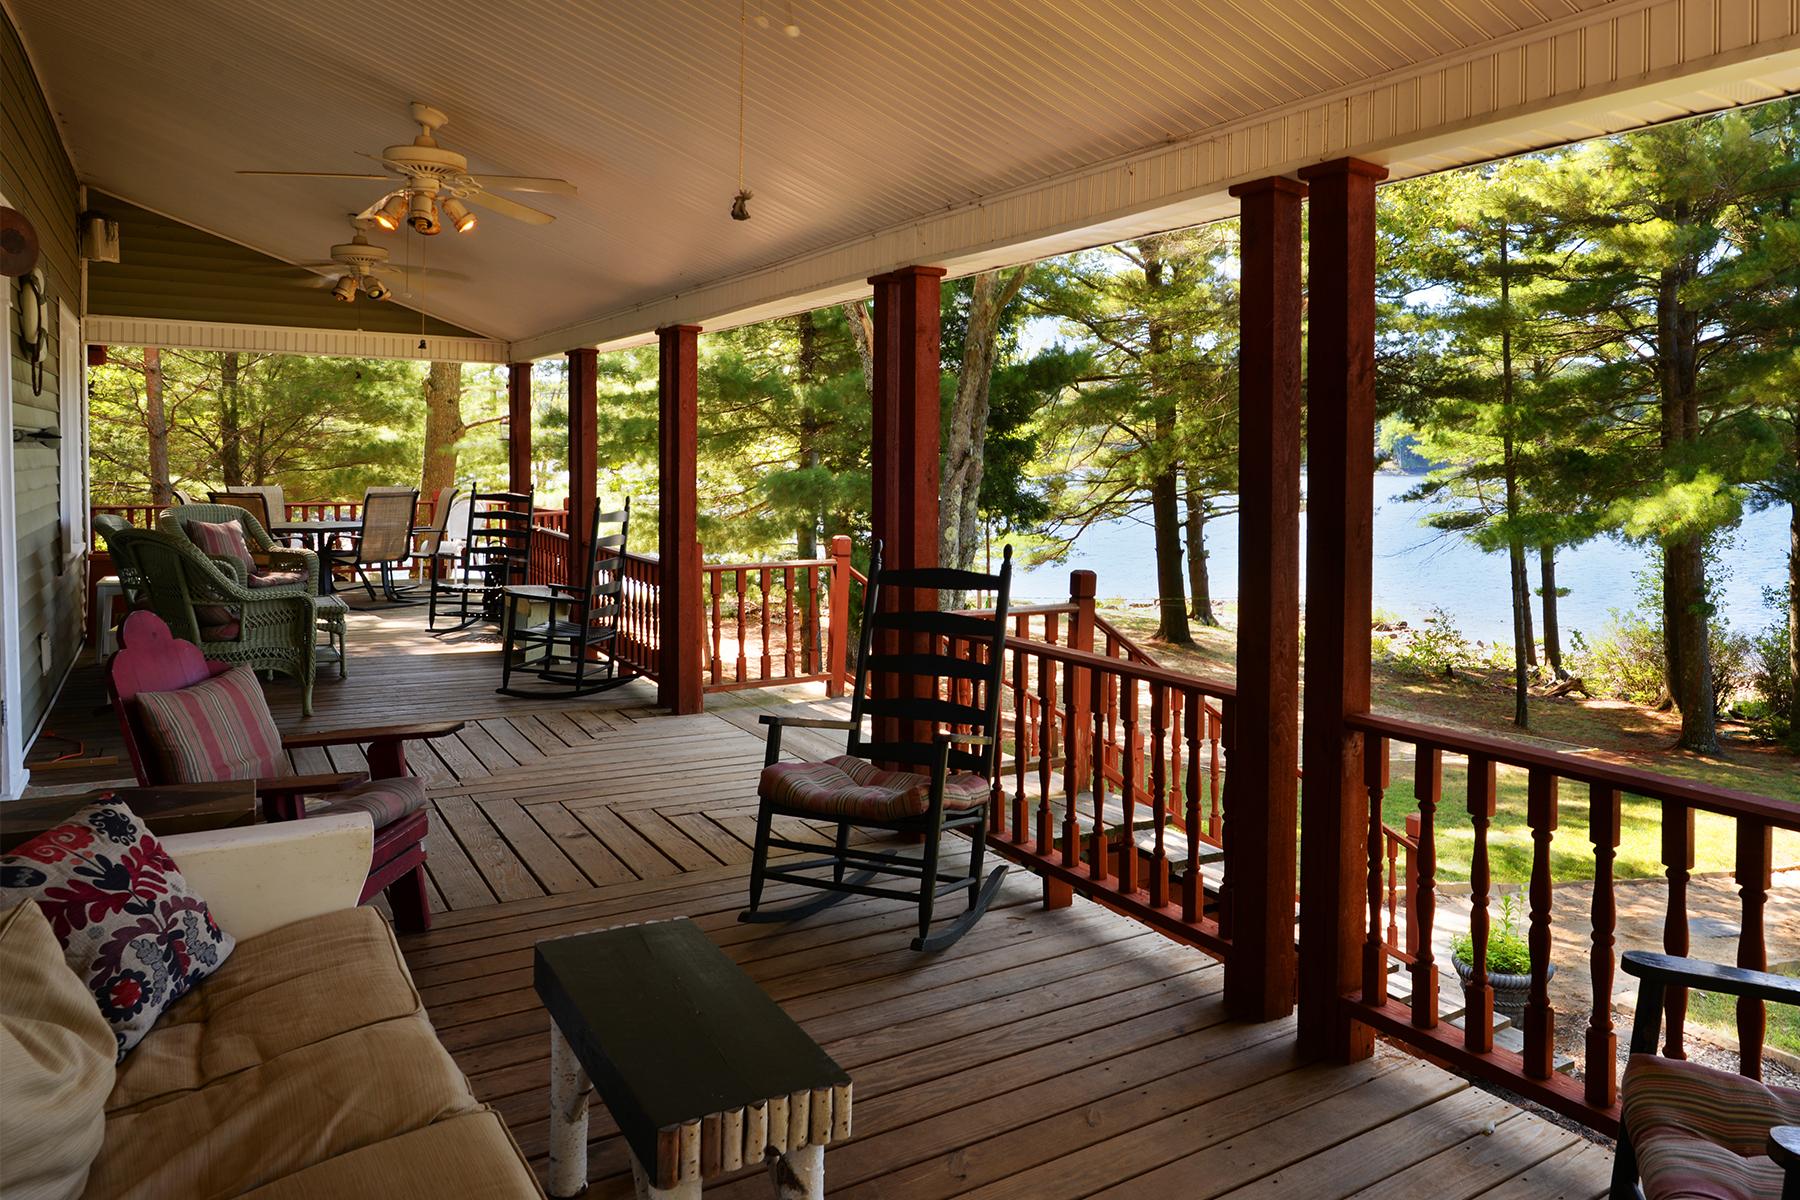 独户住宅 为 销售 在 Lake Front Home 2172 North Shore Rd, 哈德利, 纽约州, 12835 美国